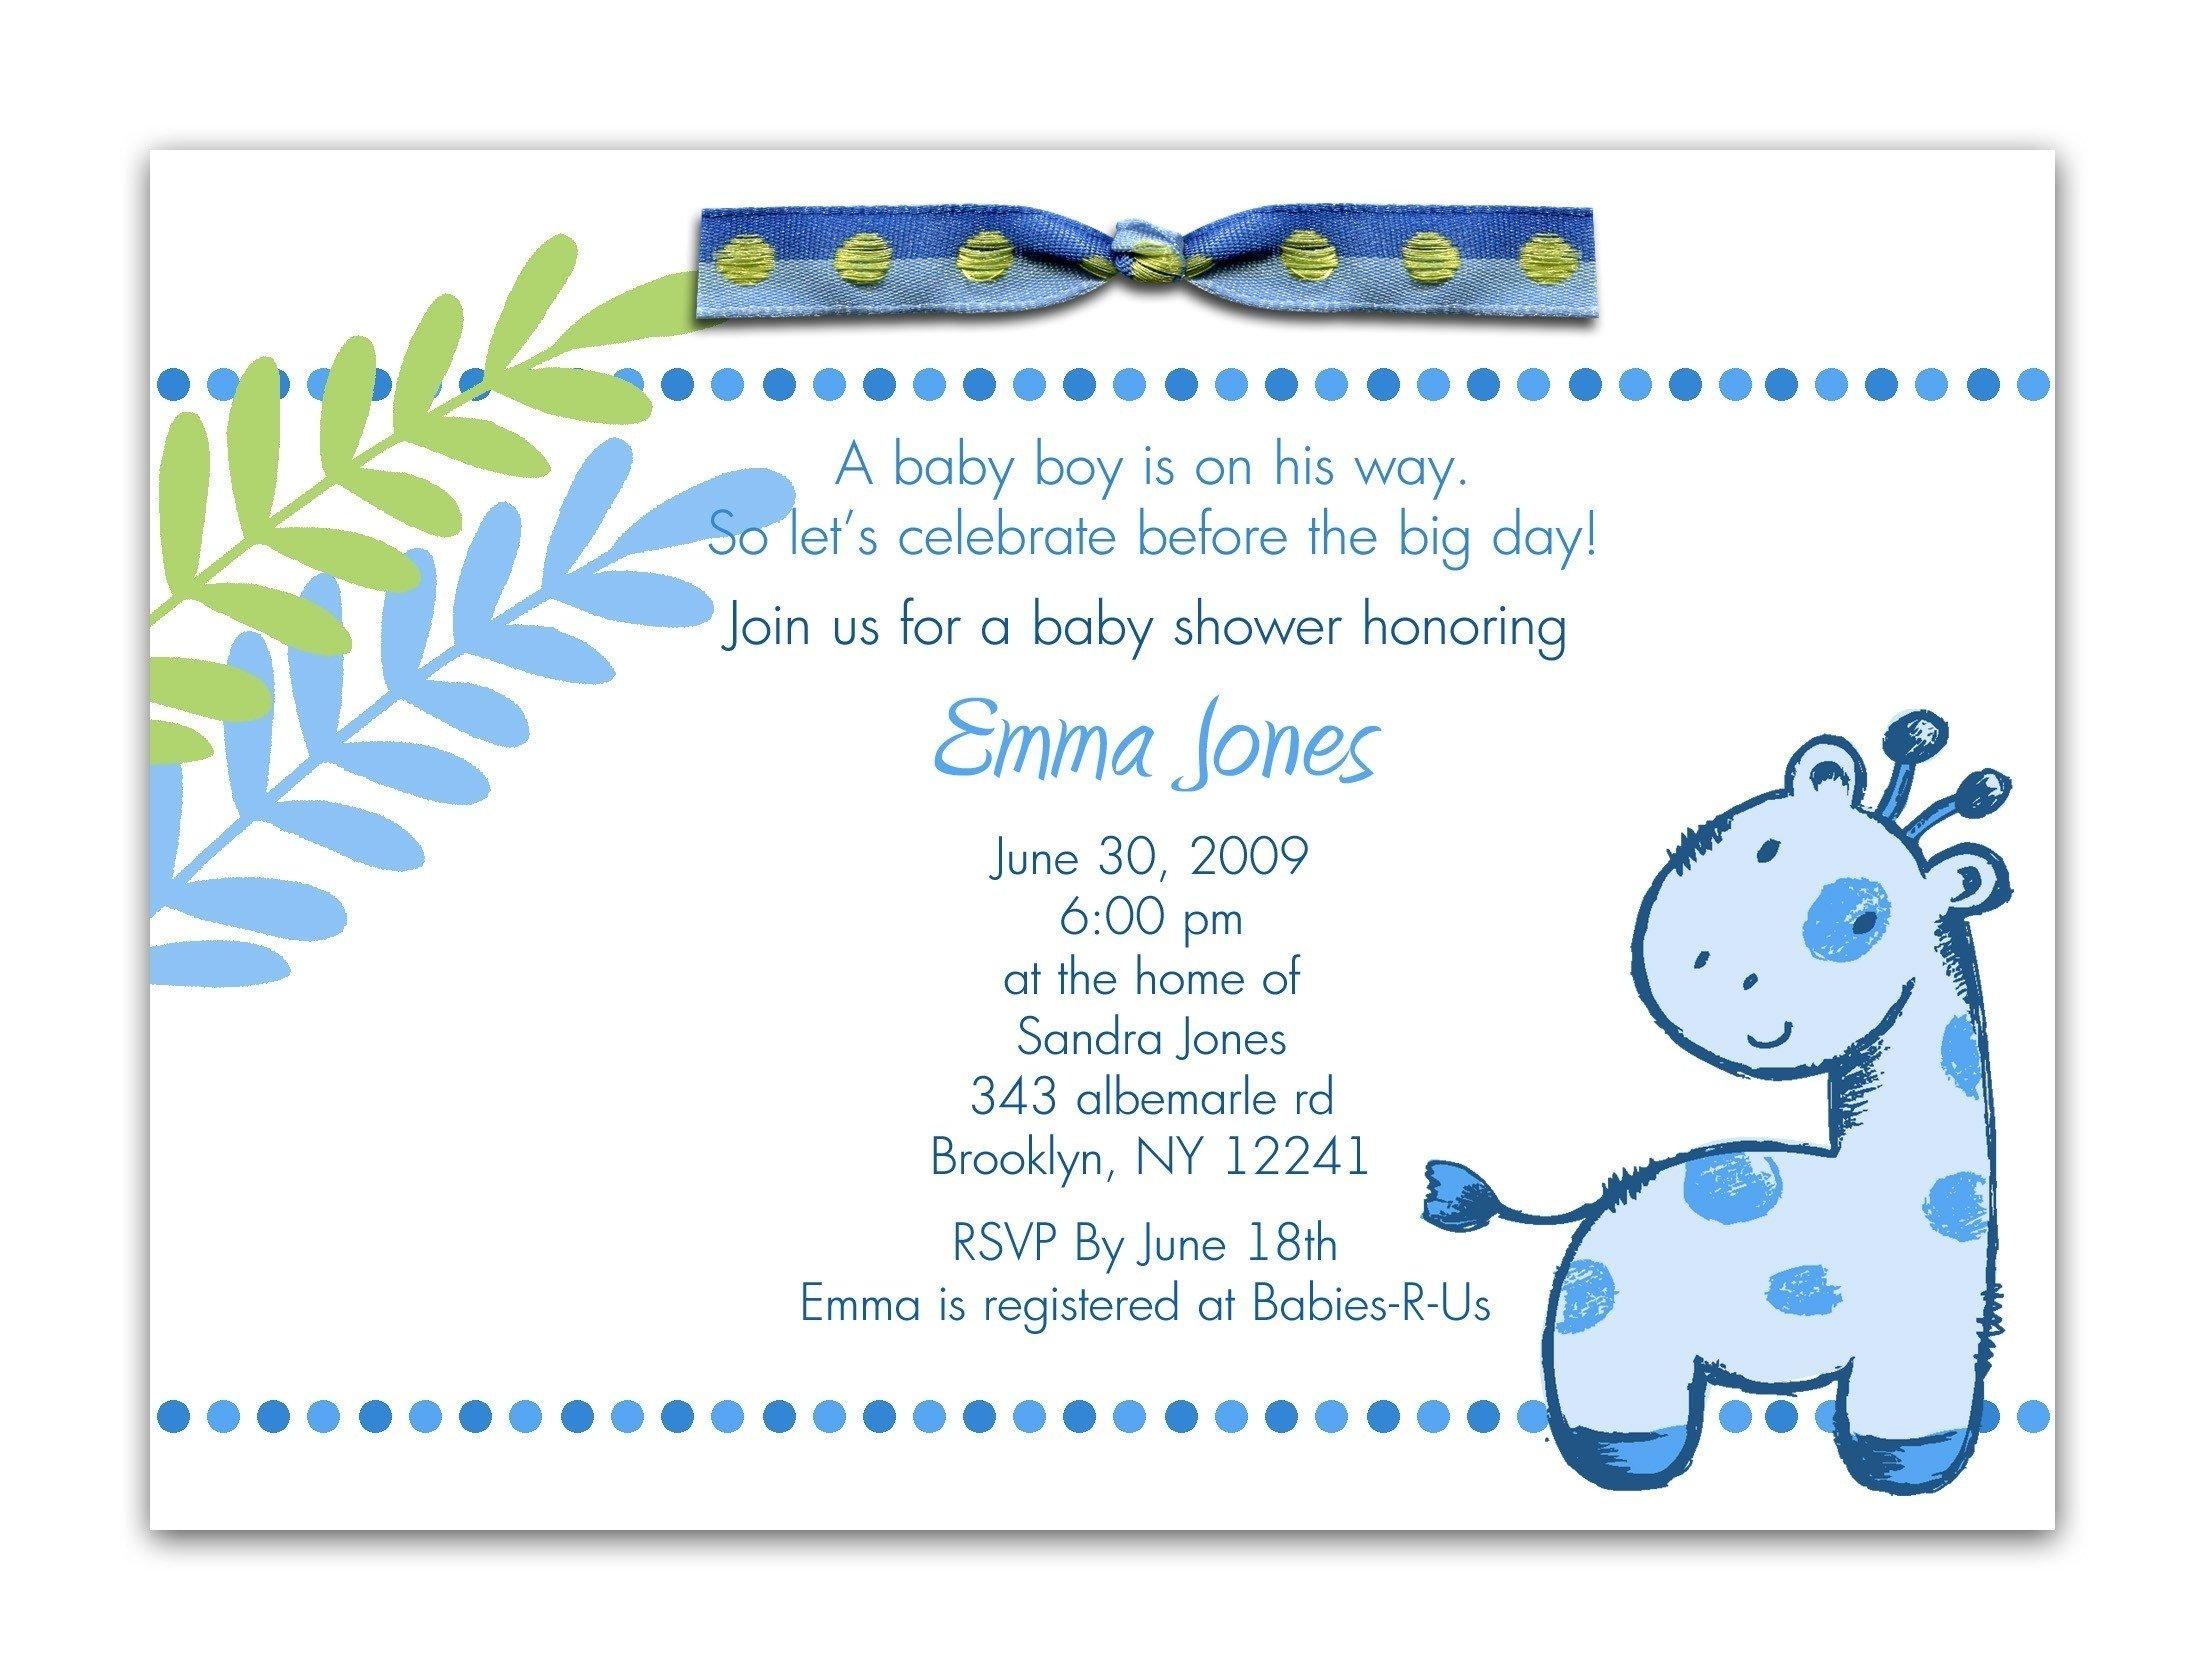 10 Lovable Boy Baby Shower Invitations Wording Ideas invitation for baby shower excellent baby boy shower invitation 2021